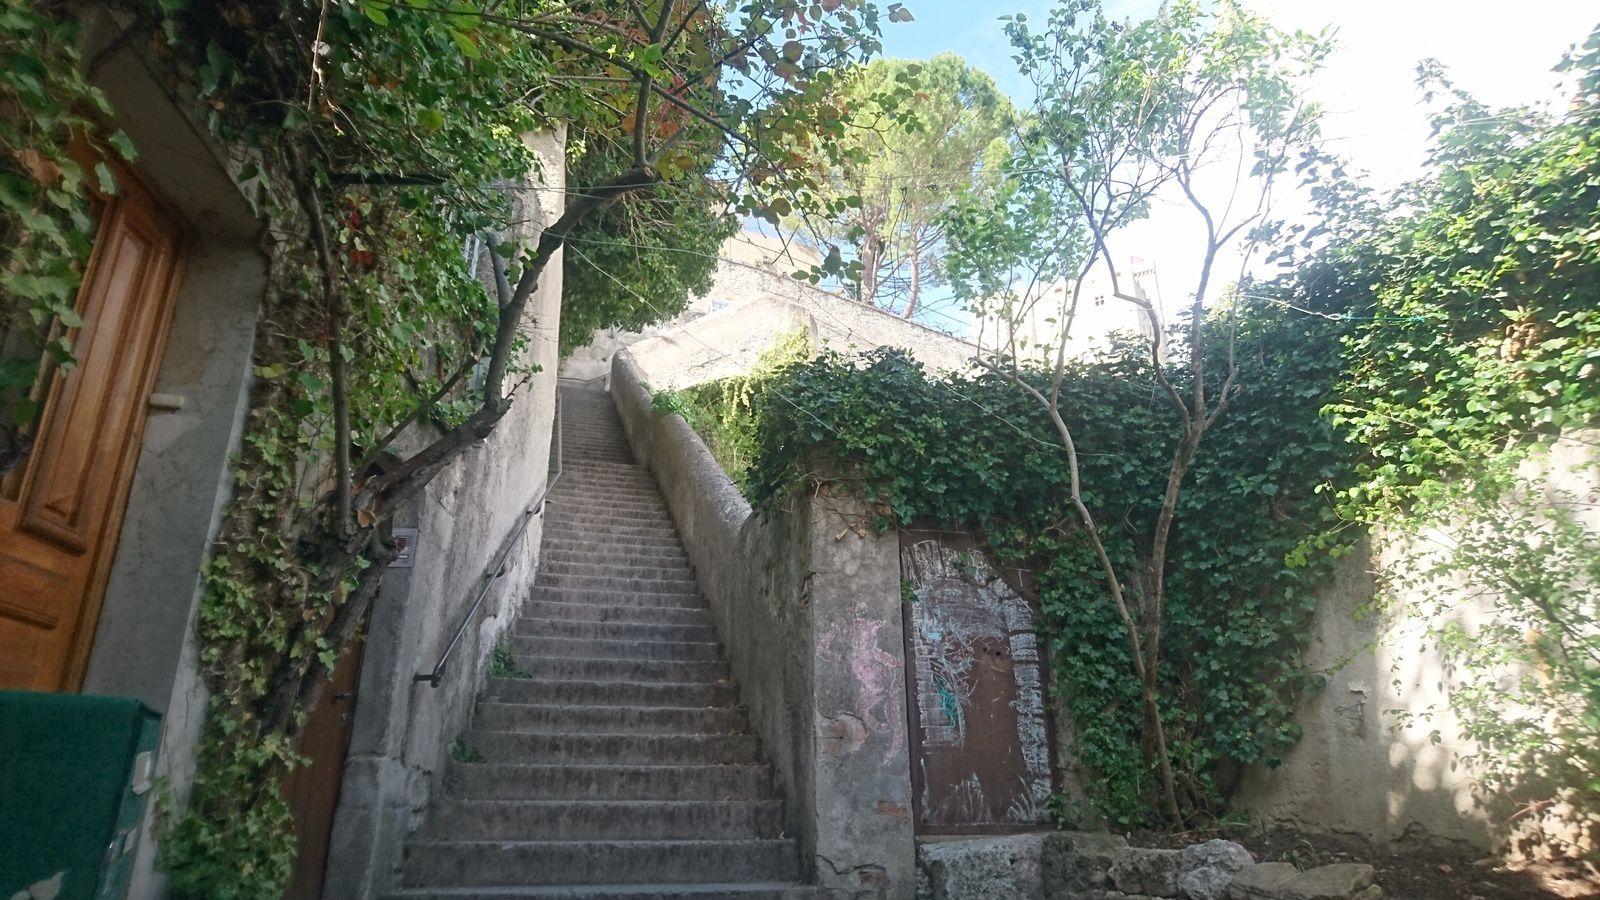 Escalier de Pierre-Louis.